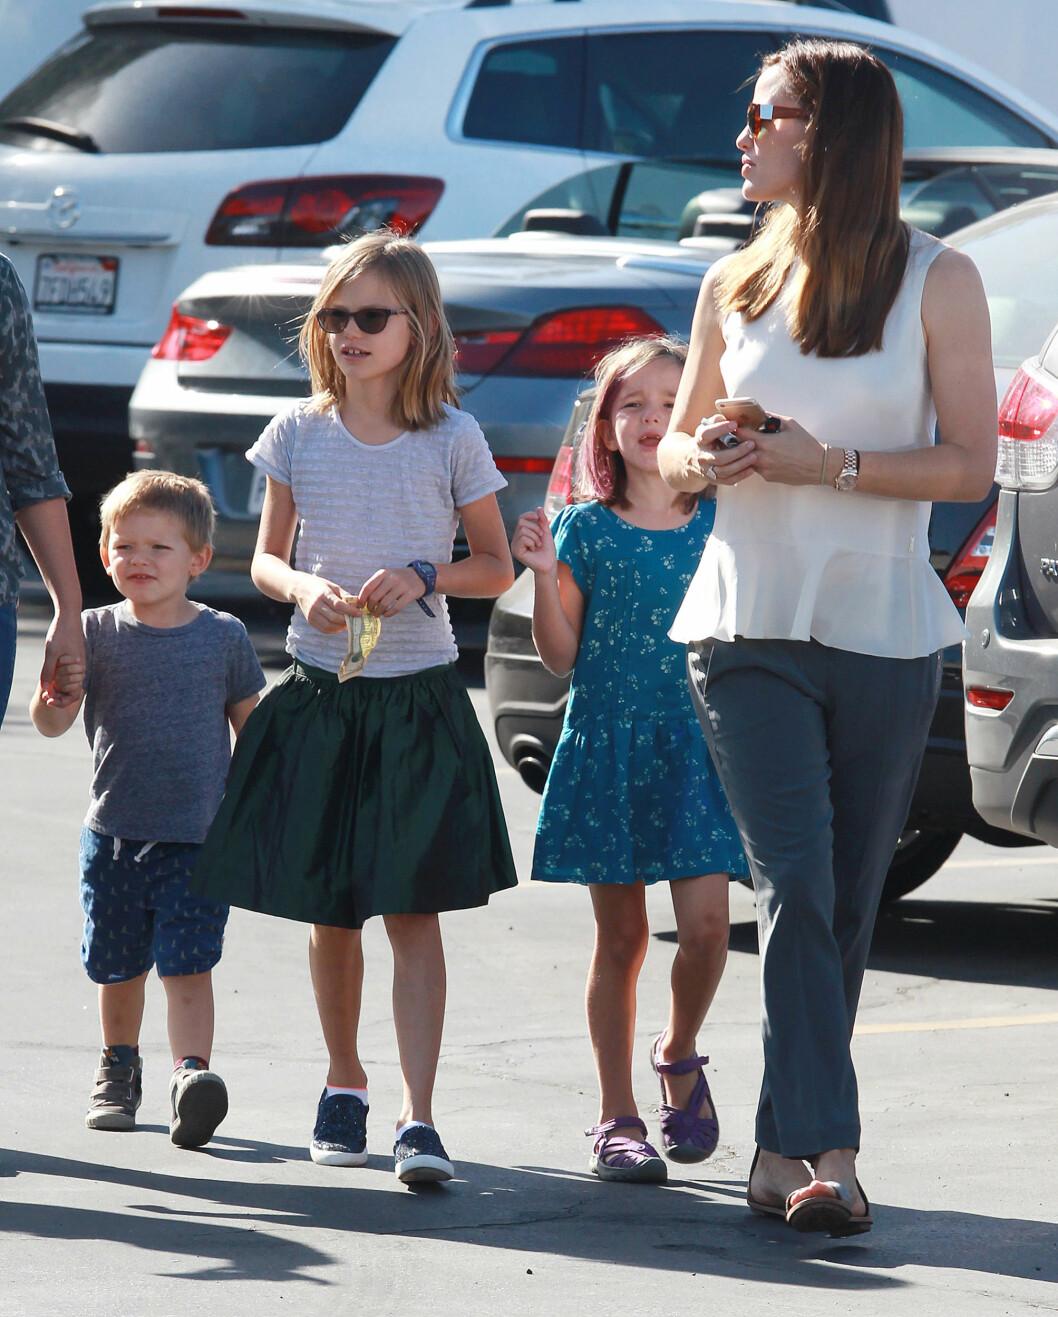 FAMILIEN FØRST: Forrige helg besøkte Jennifer Garner bondens marked i Brentwood, California sammen med barna (f.v) Samuel, Violet og Seraphina.  Foto: Broadimage